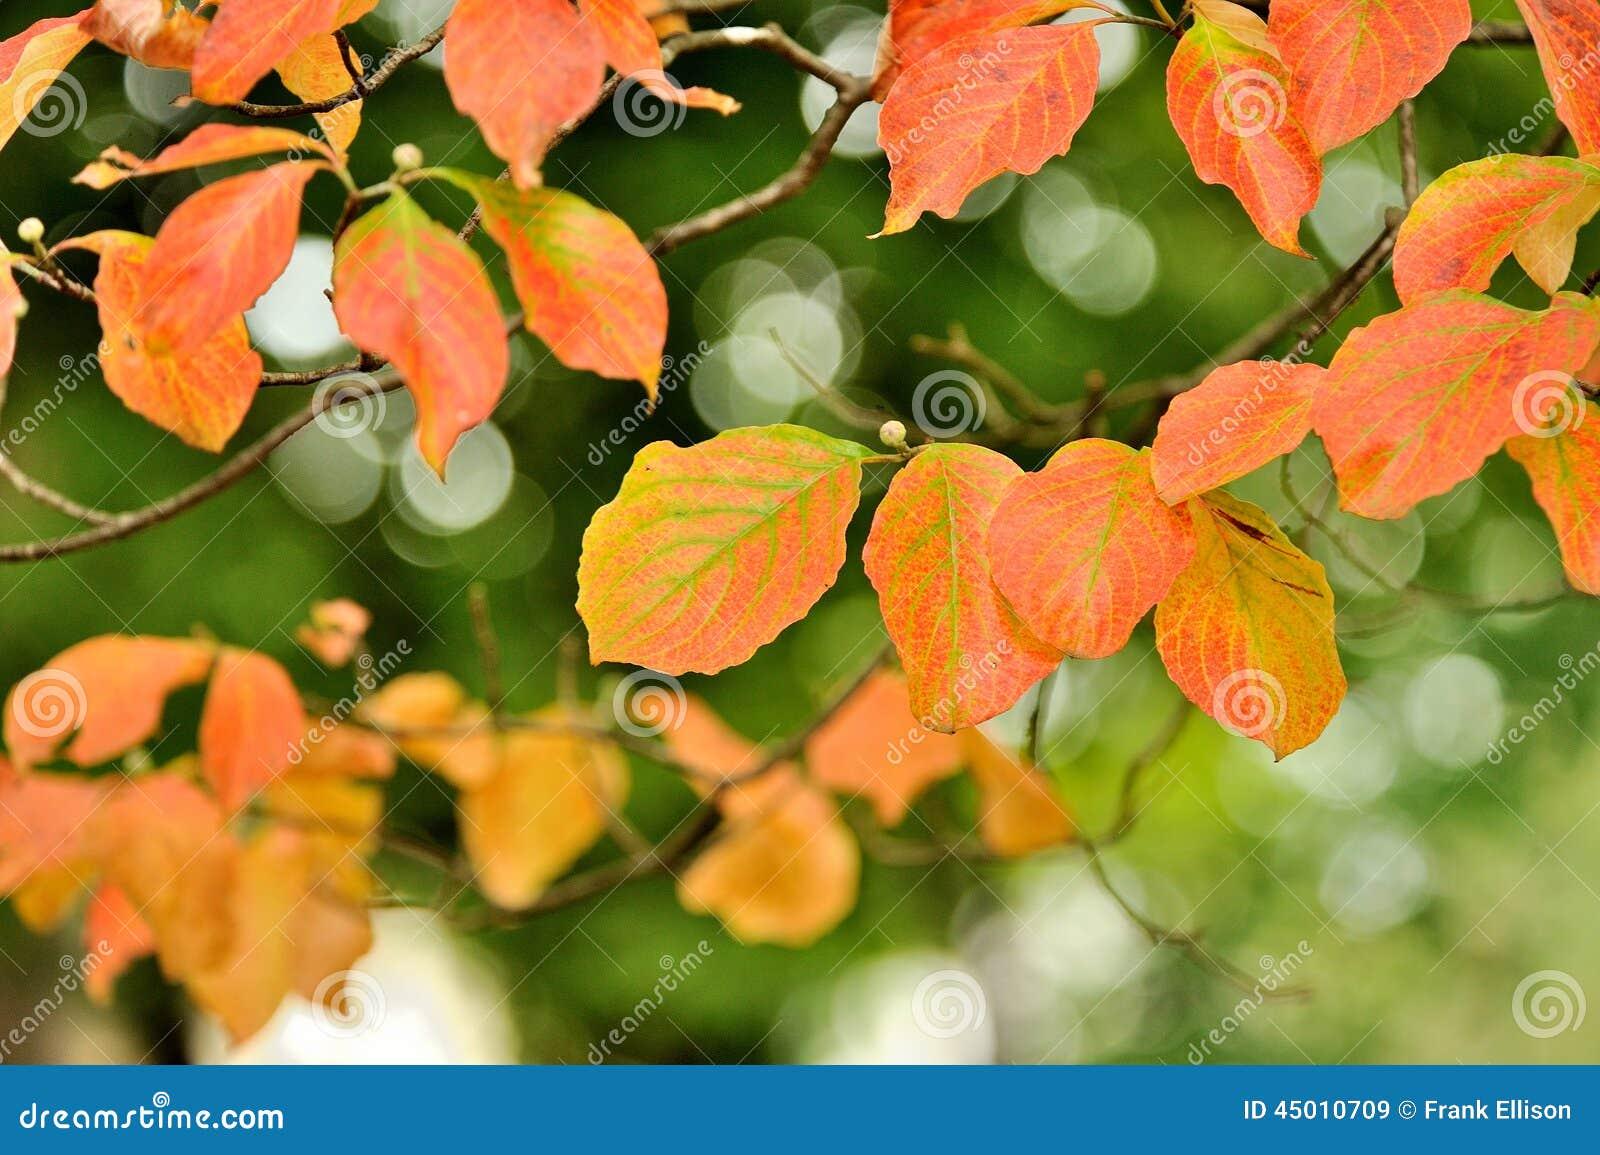 The Color of Fall stock illustration. Illustration of seasonal ...